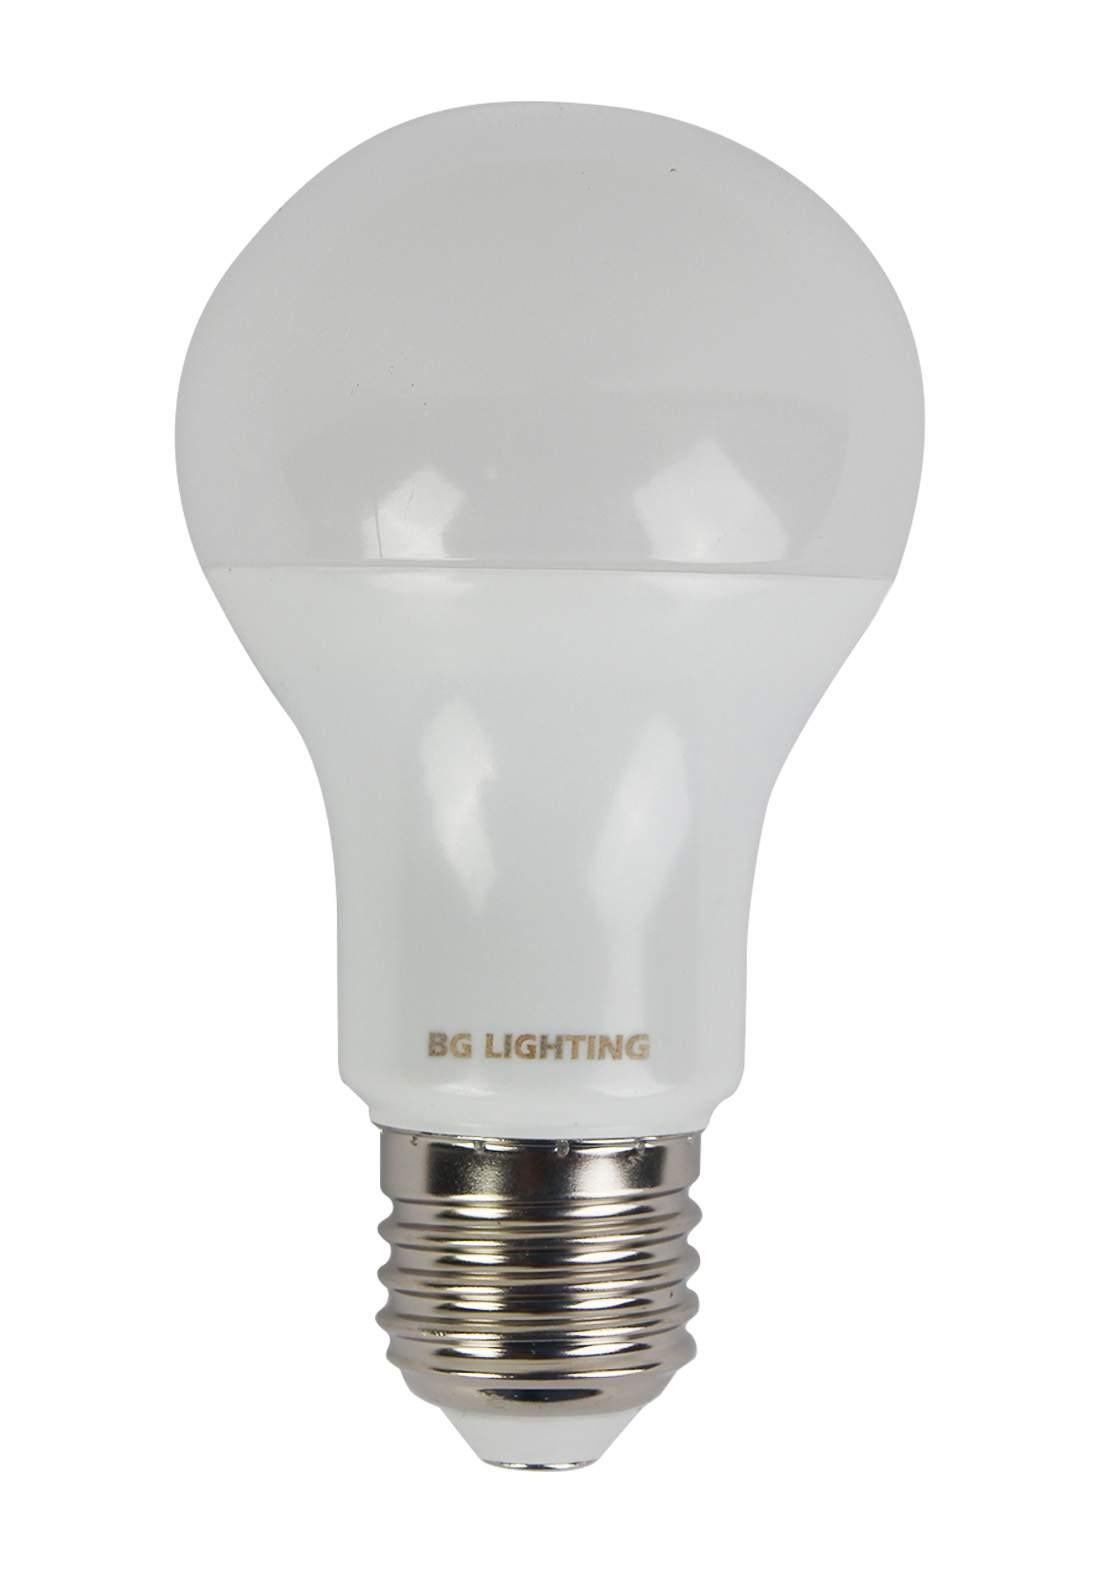 Bg BA27c11W11 led 11W مصباح ليد